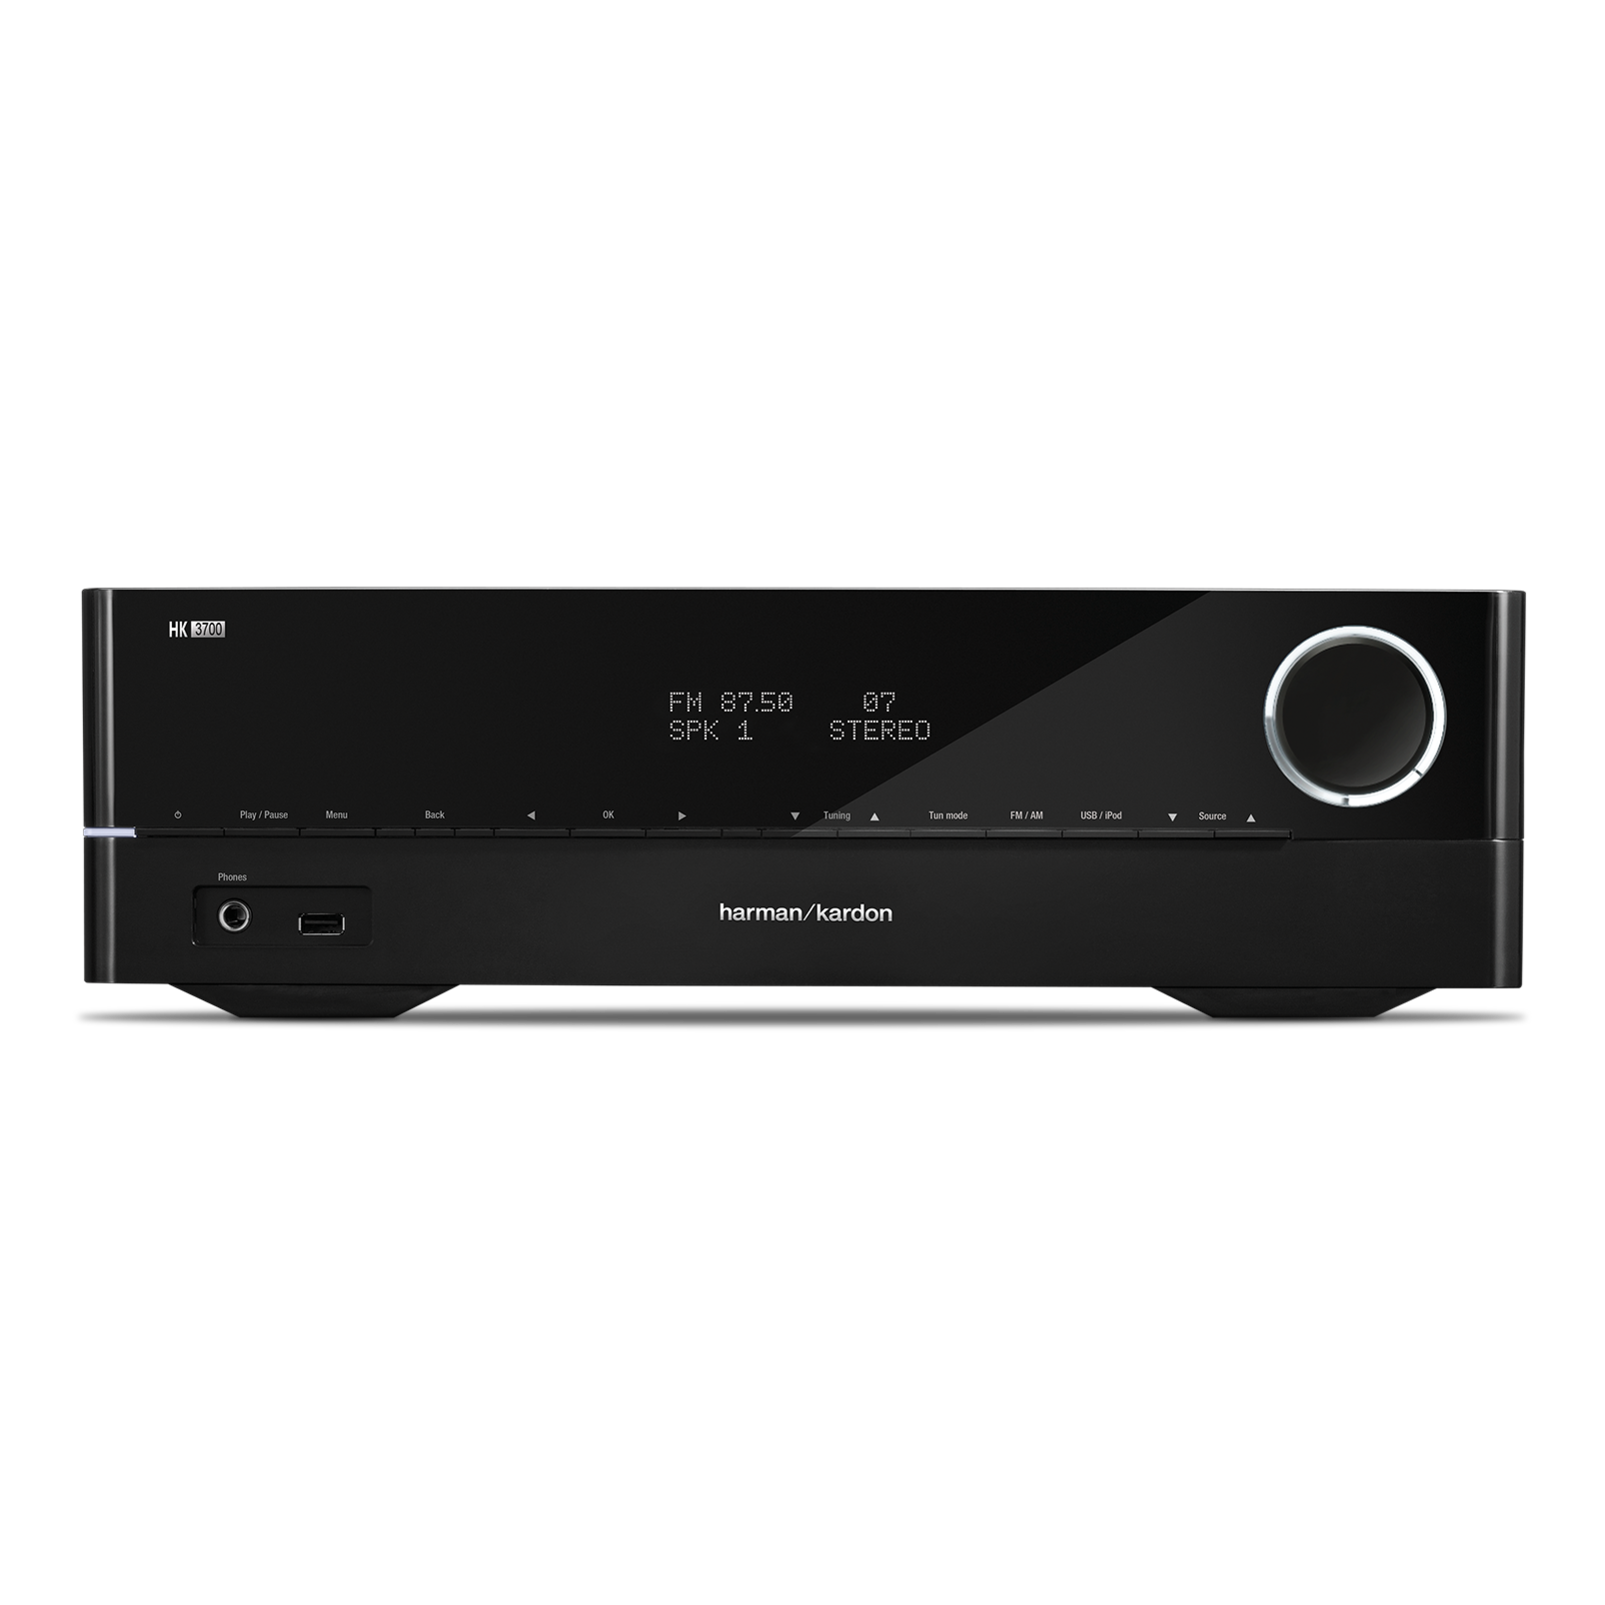 HK 3700 - Black - 170 watt stereo receiver with network connectivity - Hero